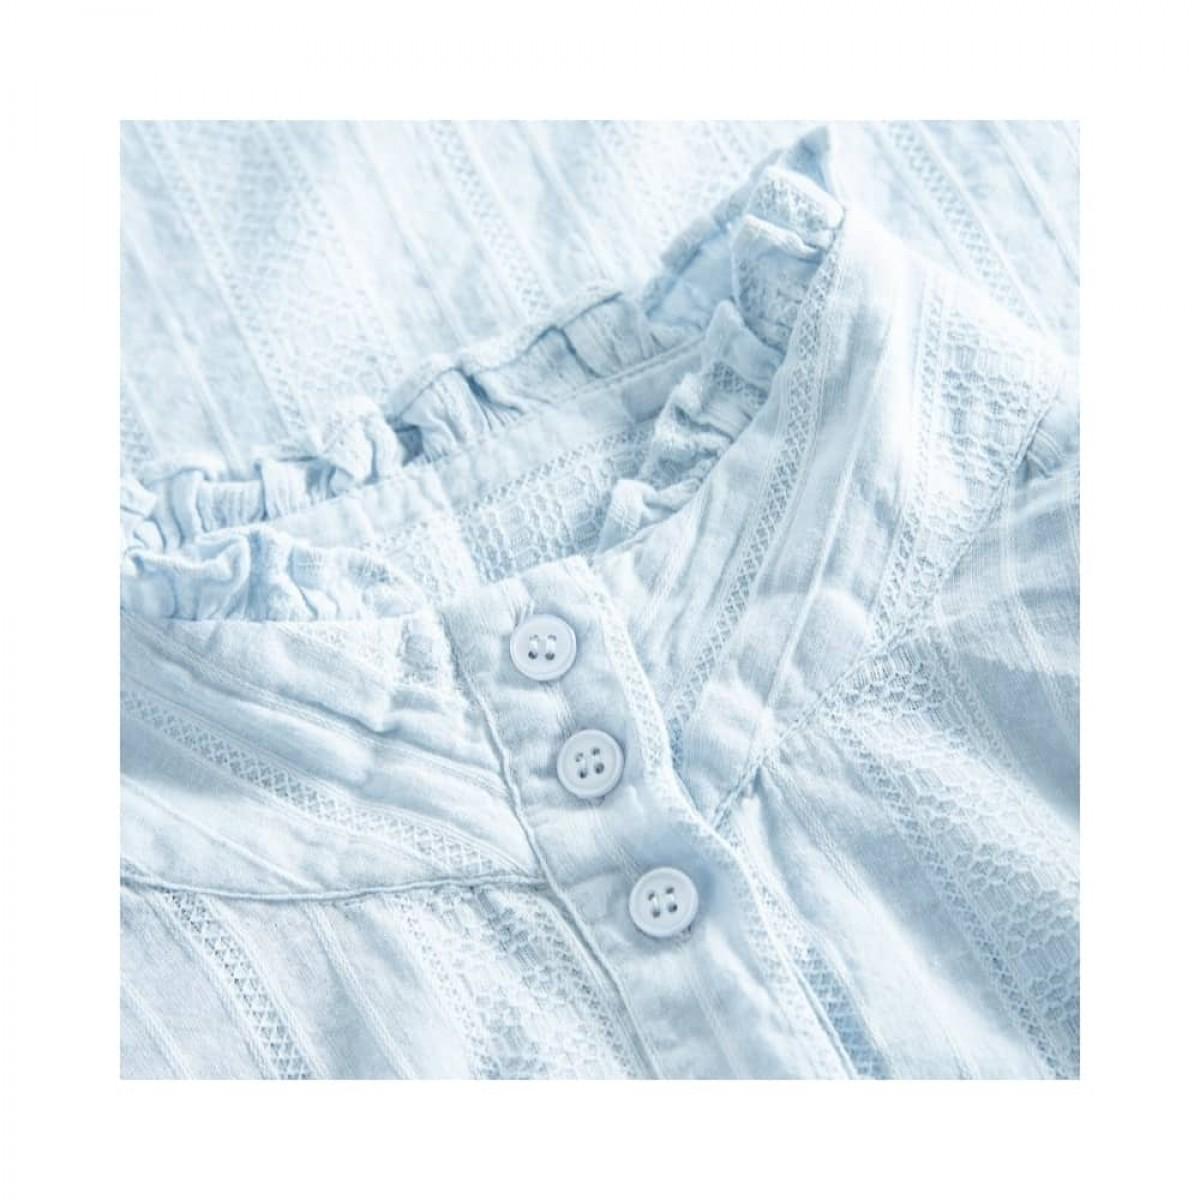 jordana dress - artic ice - krave detalje